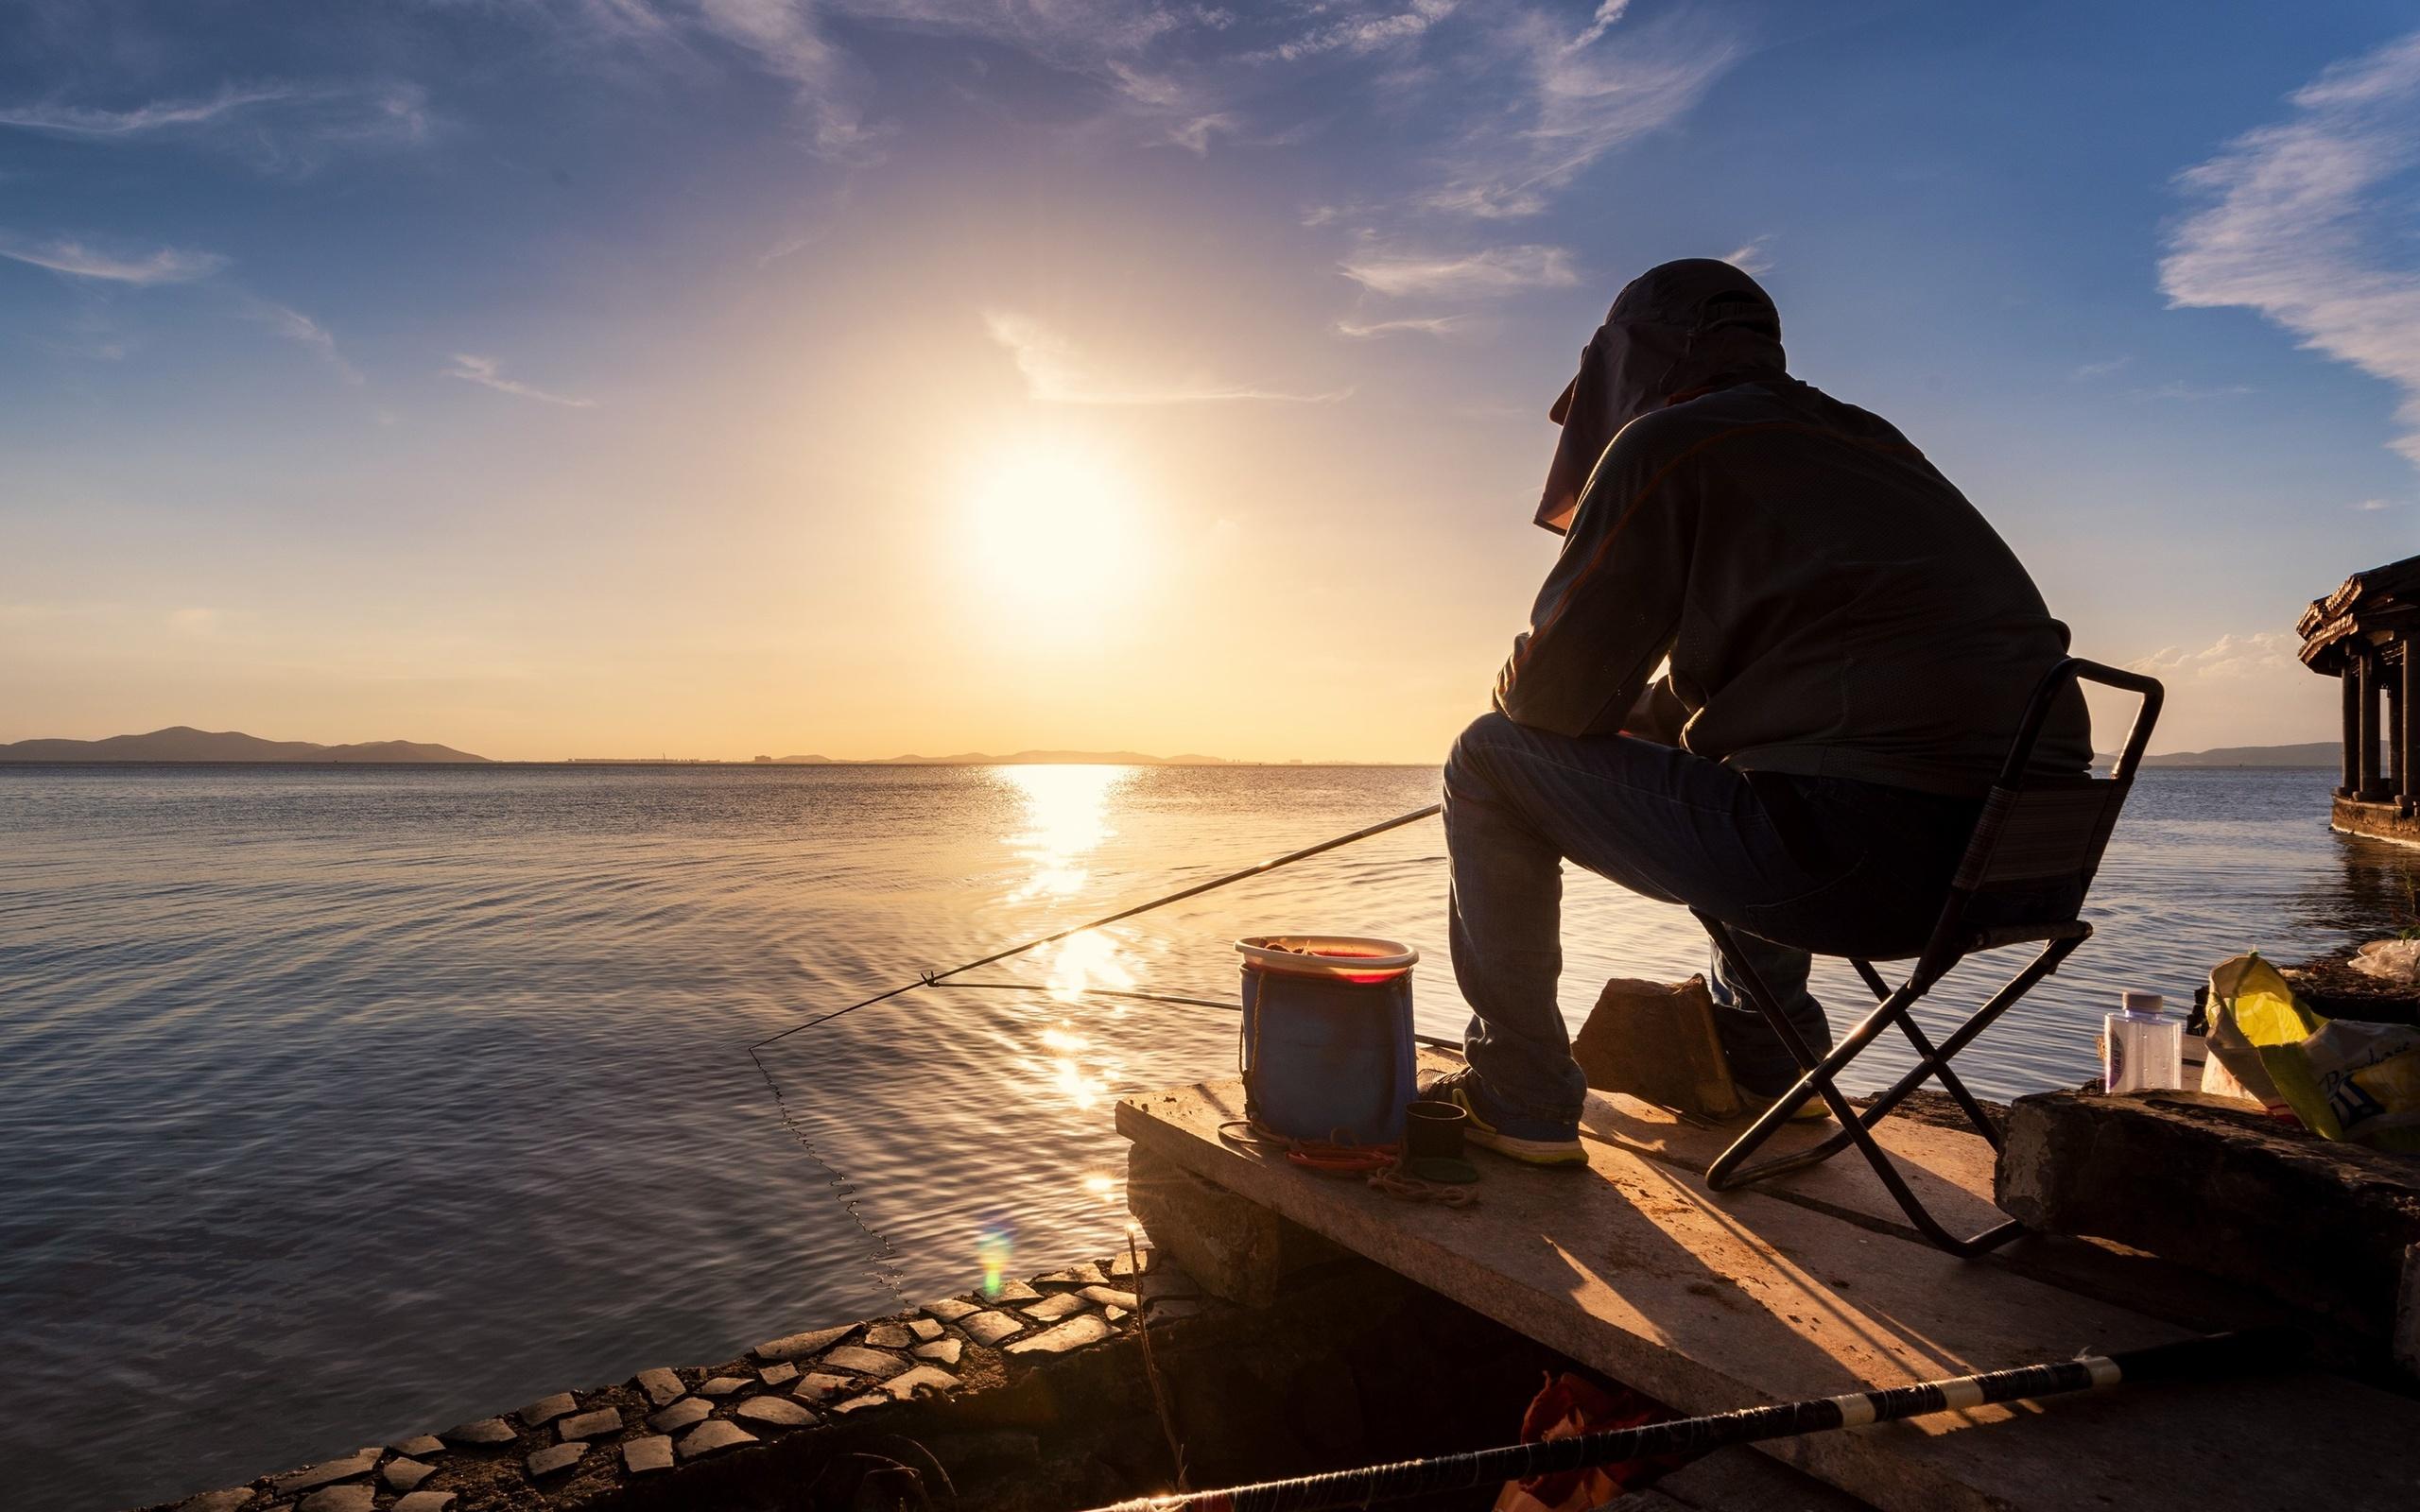 Человек, рыбалка, озеро, восход, утро